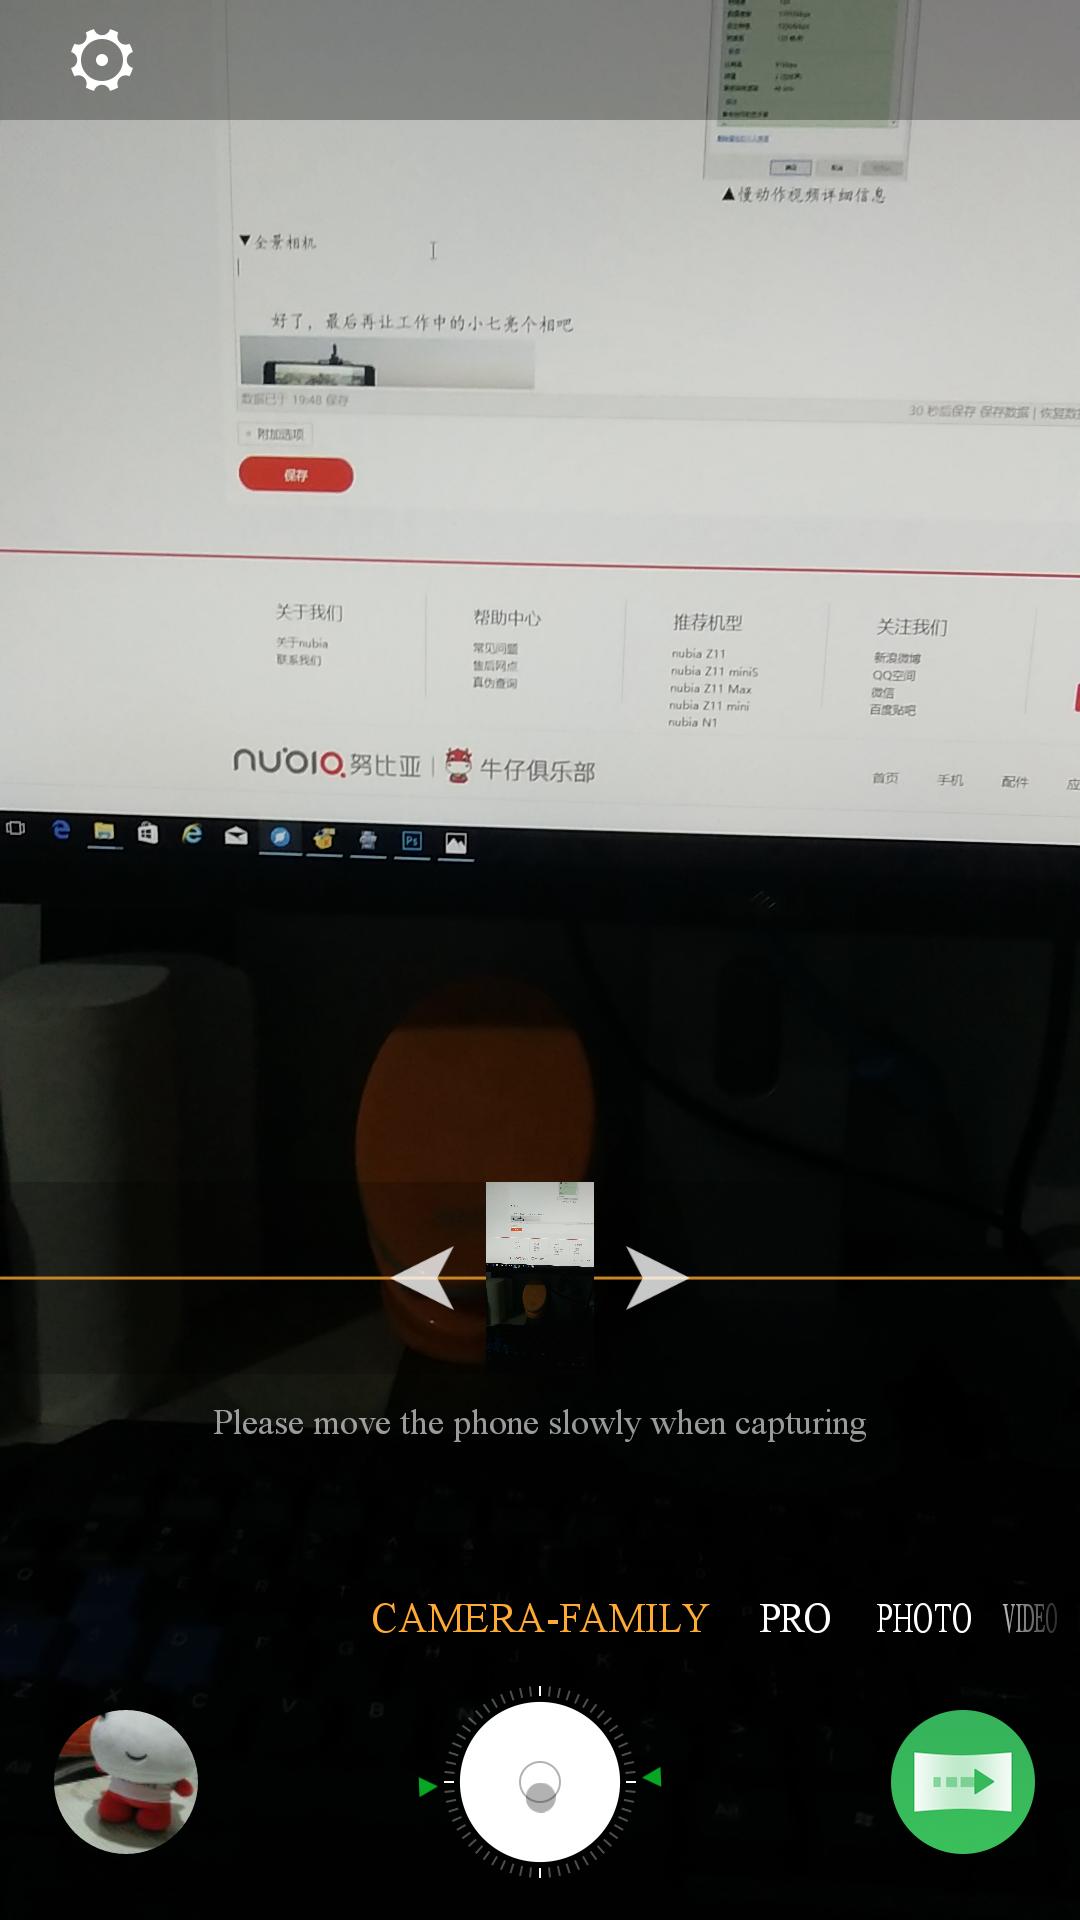 Screenshot_2017-05-14-19-48-50.png